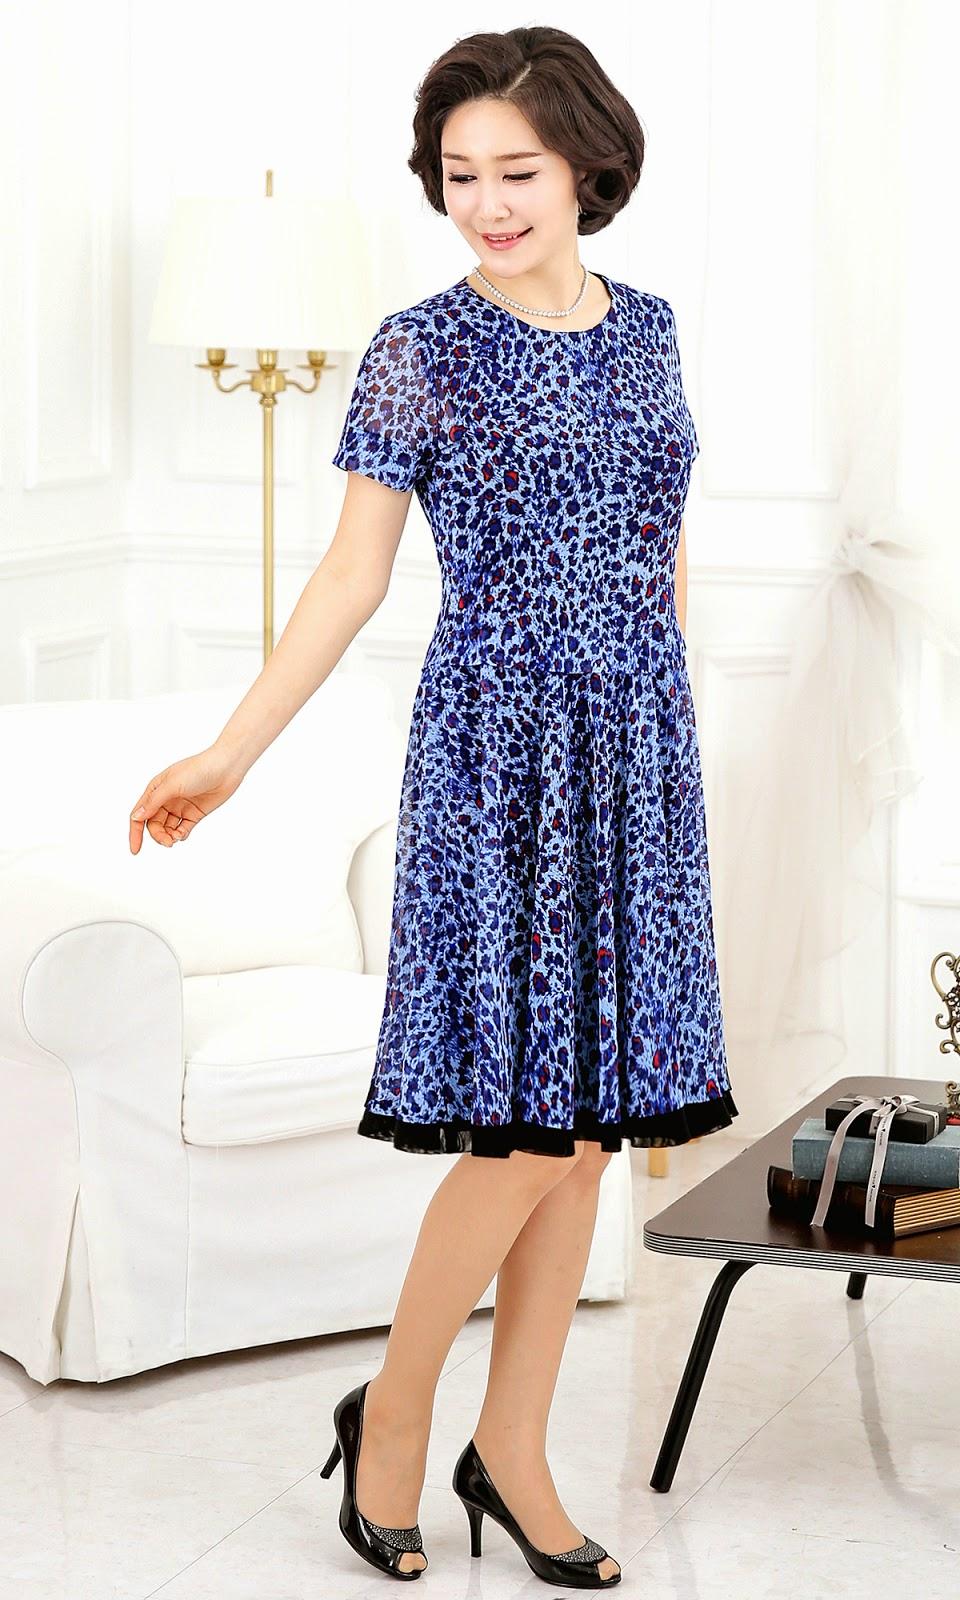 Middle-Agedolder Womens Fashion Clothing Apparel-4297